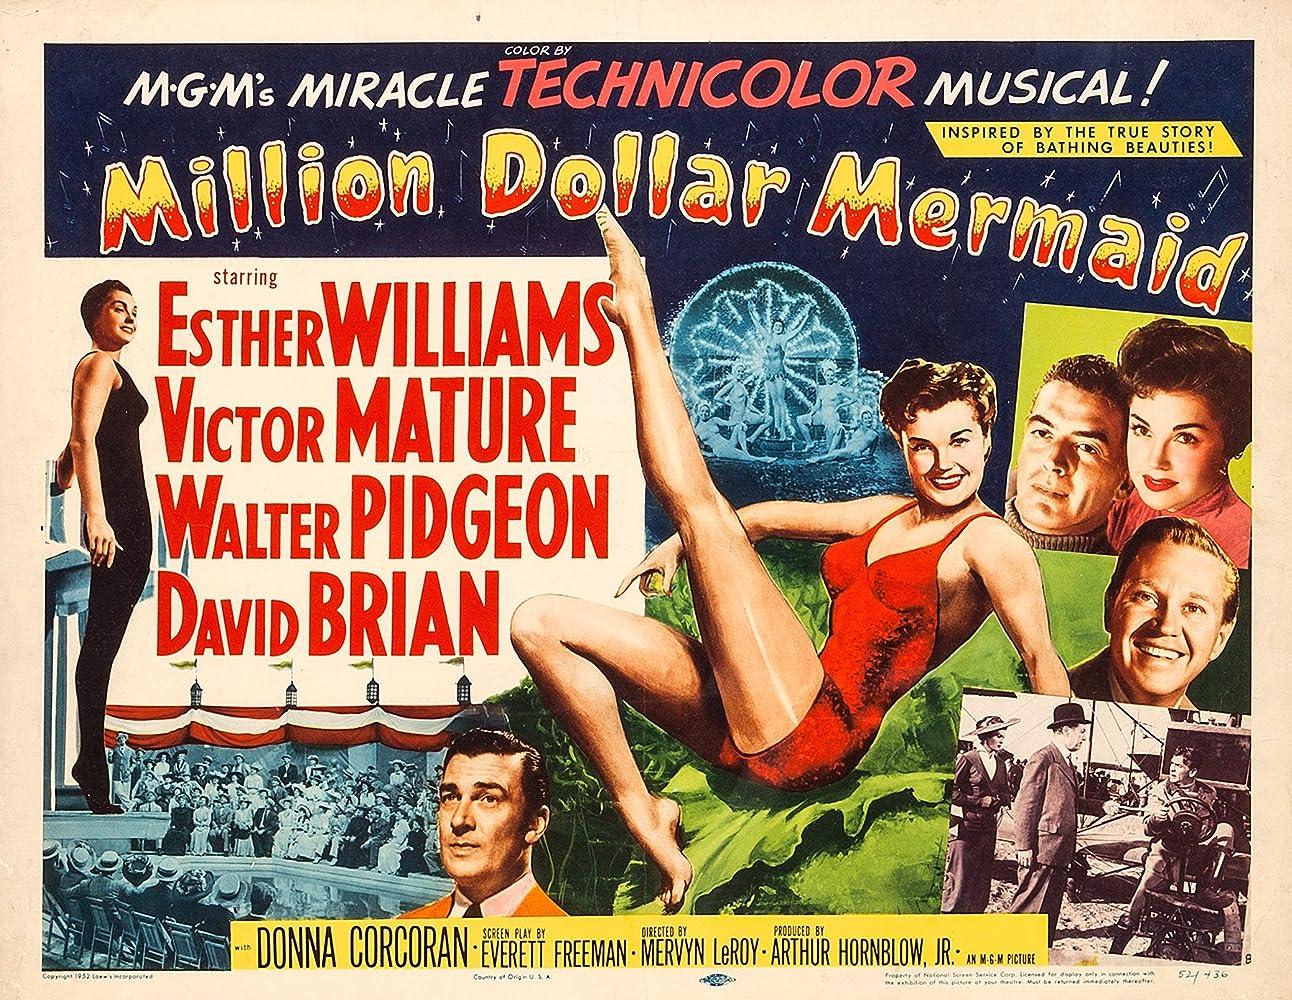 Victor Mature, David Brian, Walter Pidgeon, and Esther Williams in Million Dollar Mermaid (1952)